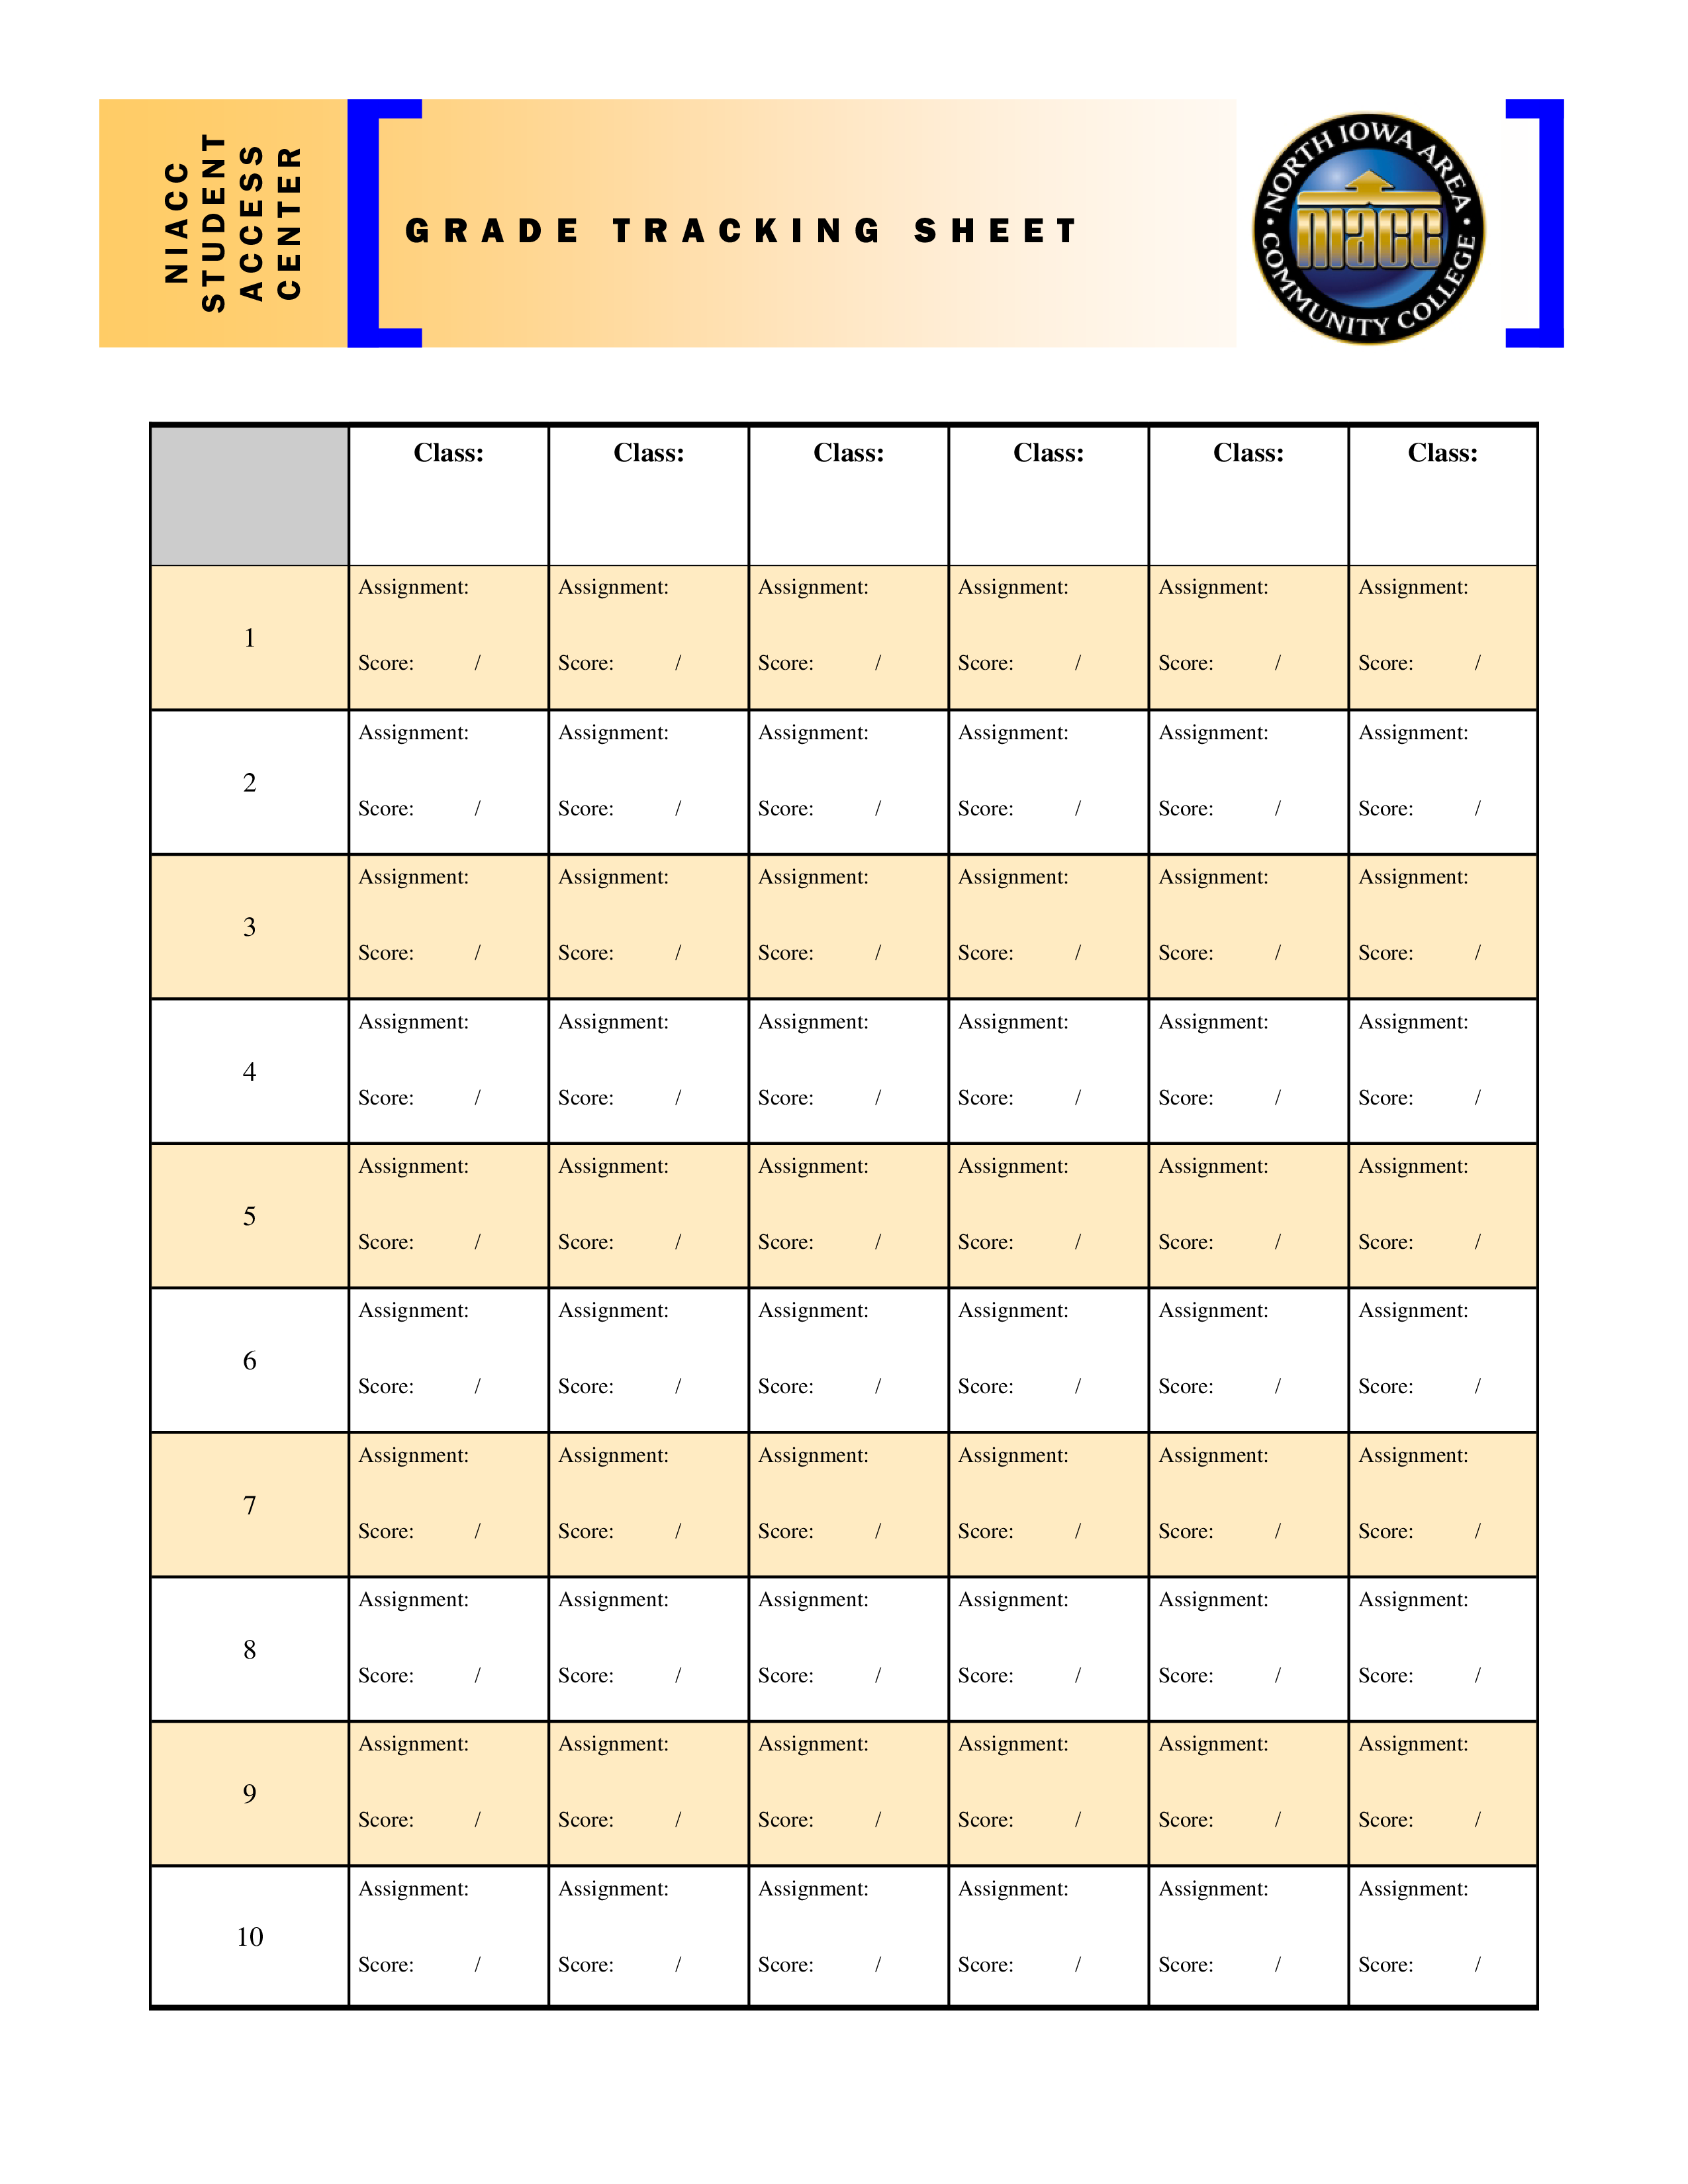 Free grade tracking sheet templates at allbusinesstemplates grade tracking sheet main image download template maxwellsz